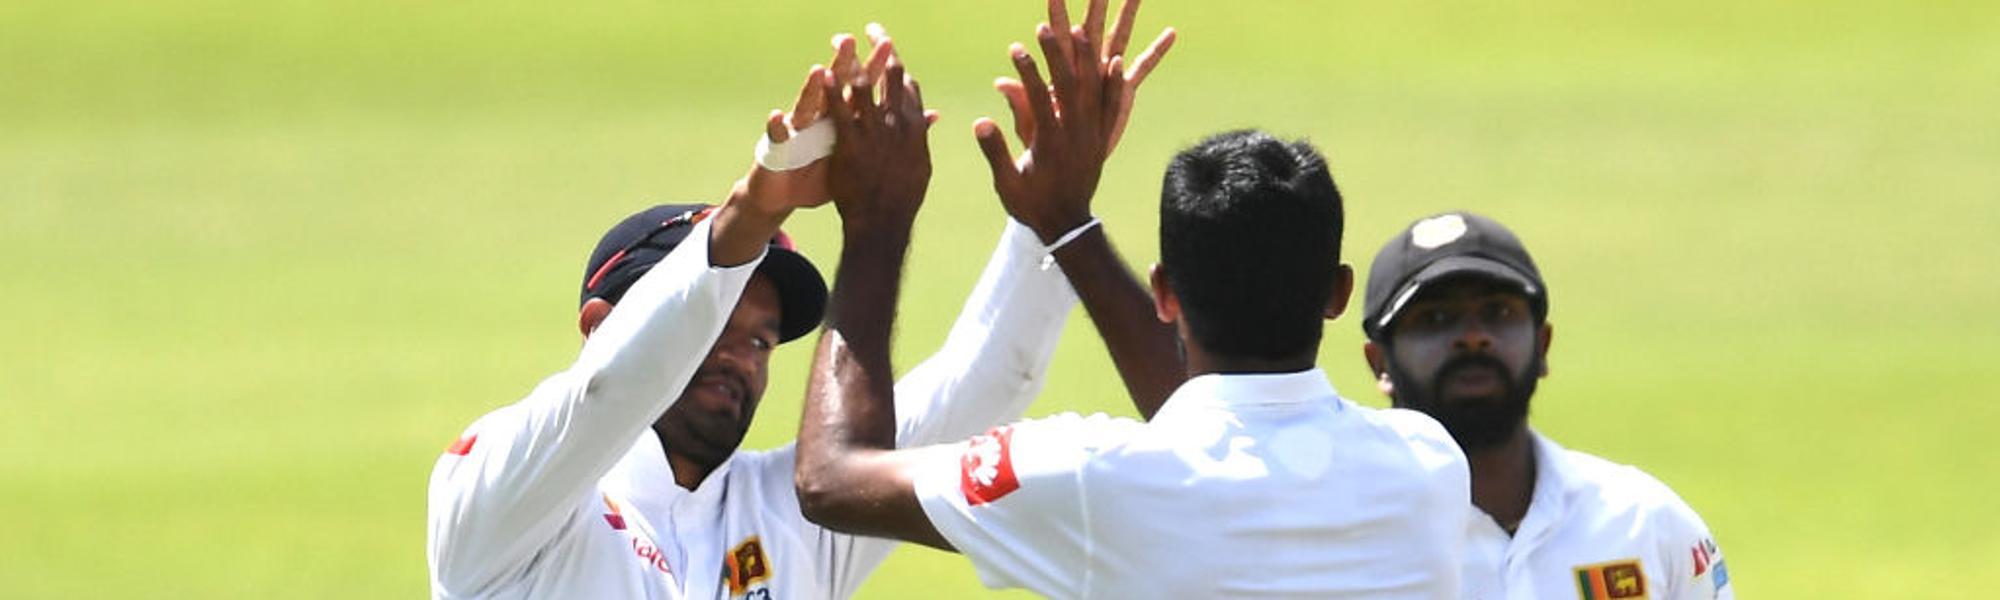 Sri Lanka South Africa